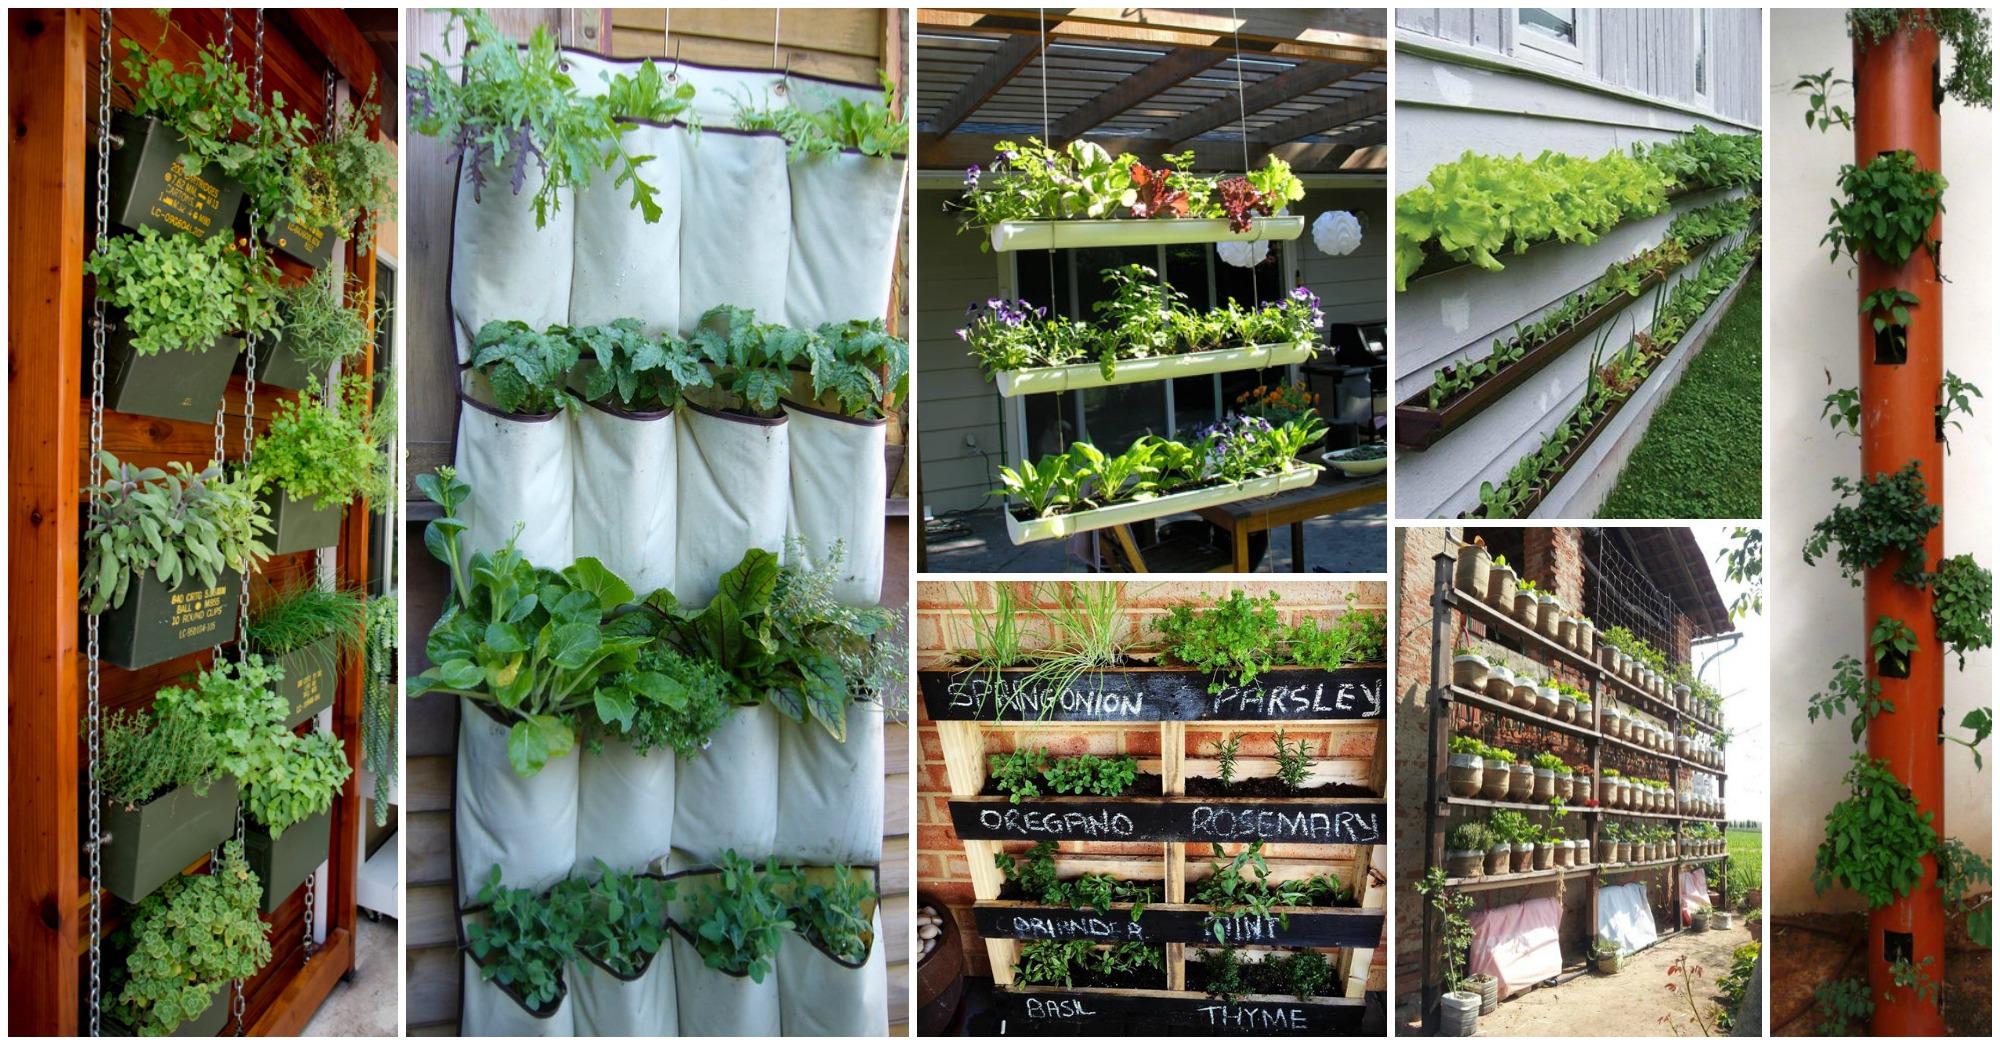 Vertical Herb Garden In Your Kitchen Vertical Herb Gardens For Small Yards